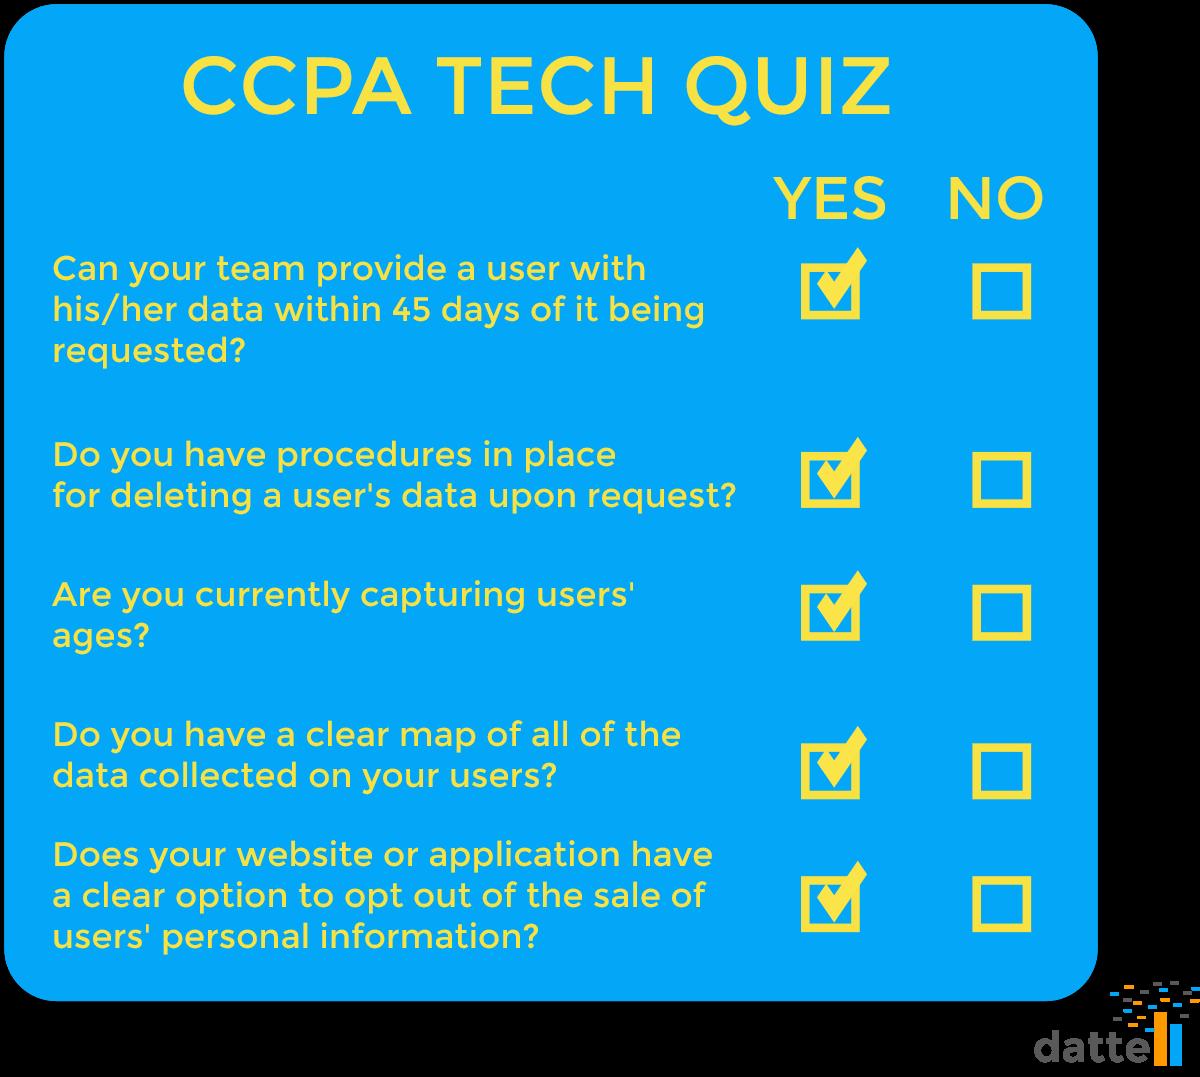 ccpa quiz1